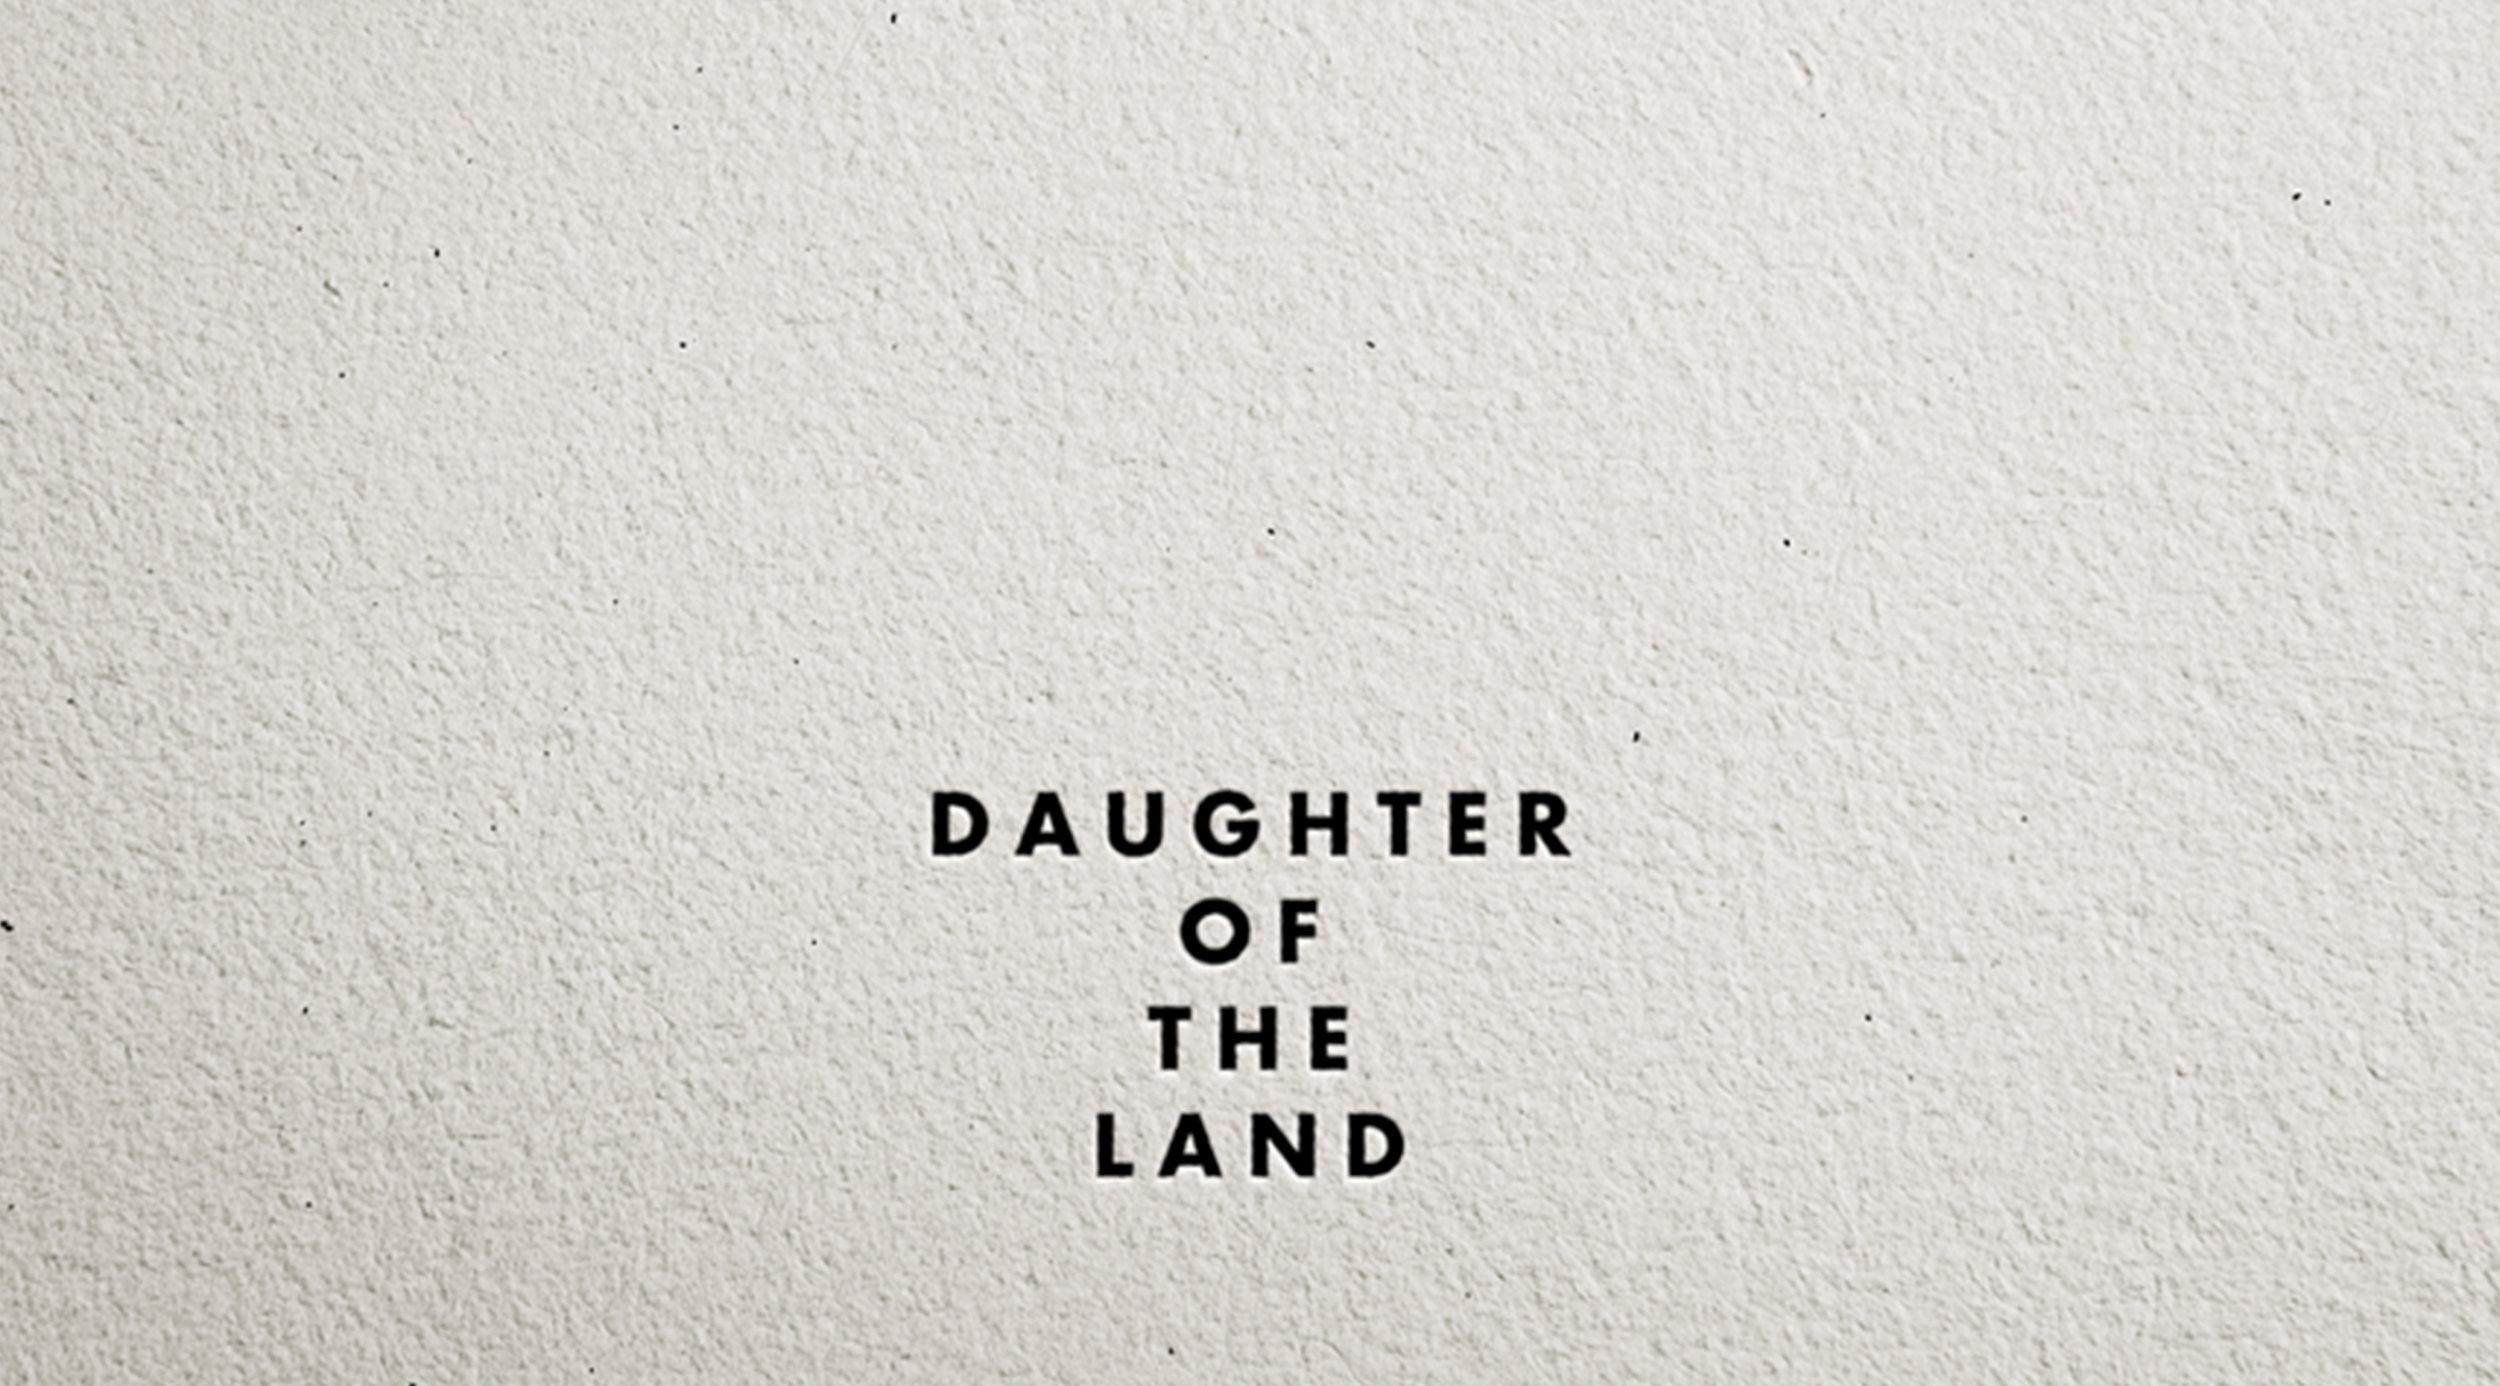 9_8_16_DaughterLogo_Mockup.jpg